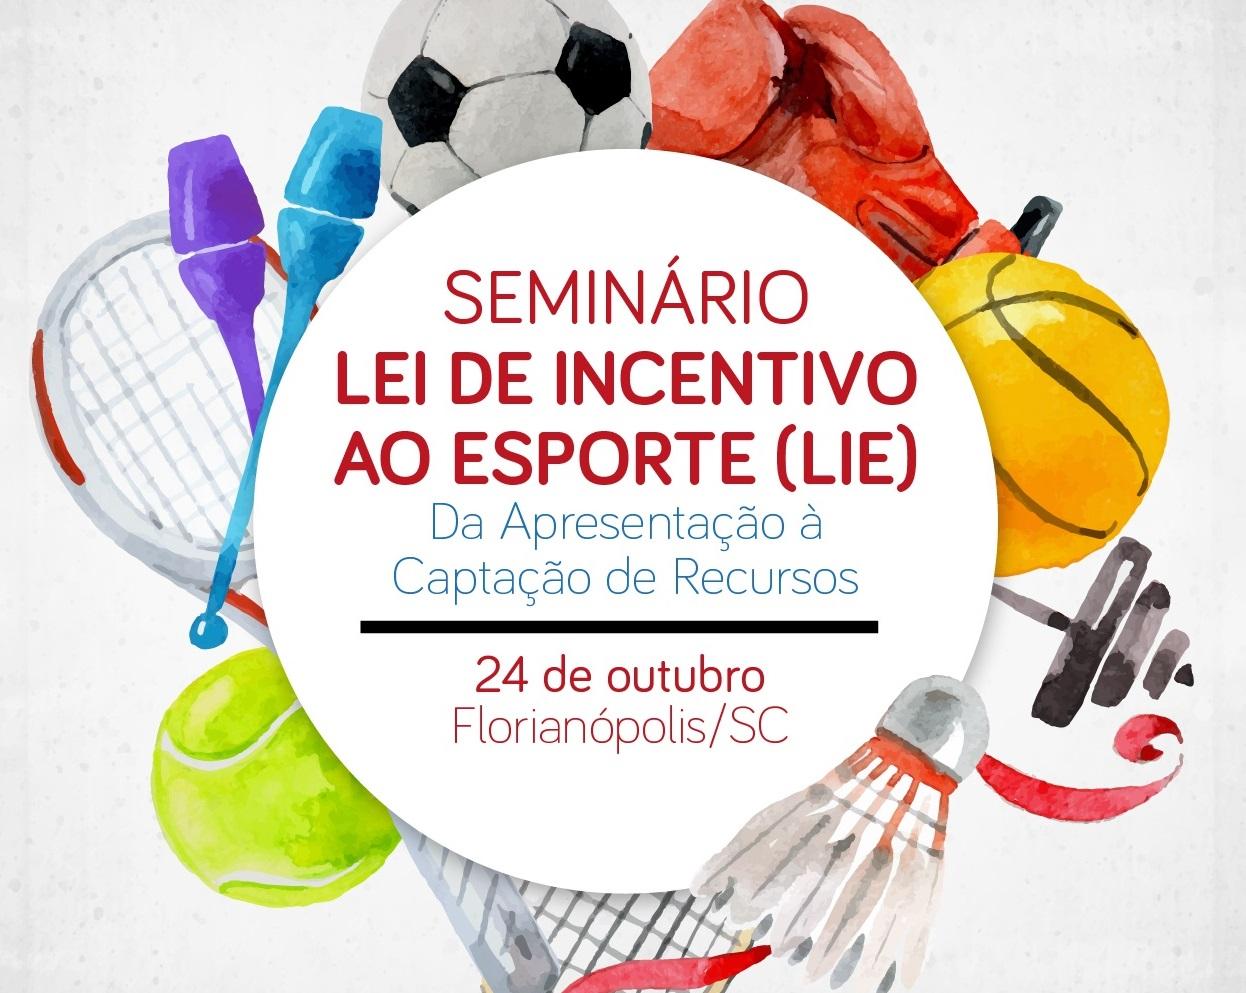 LIE Florianópolis